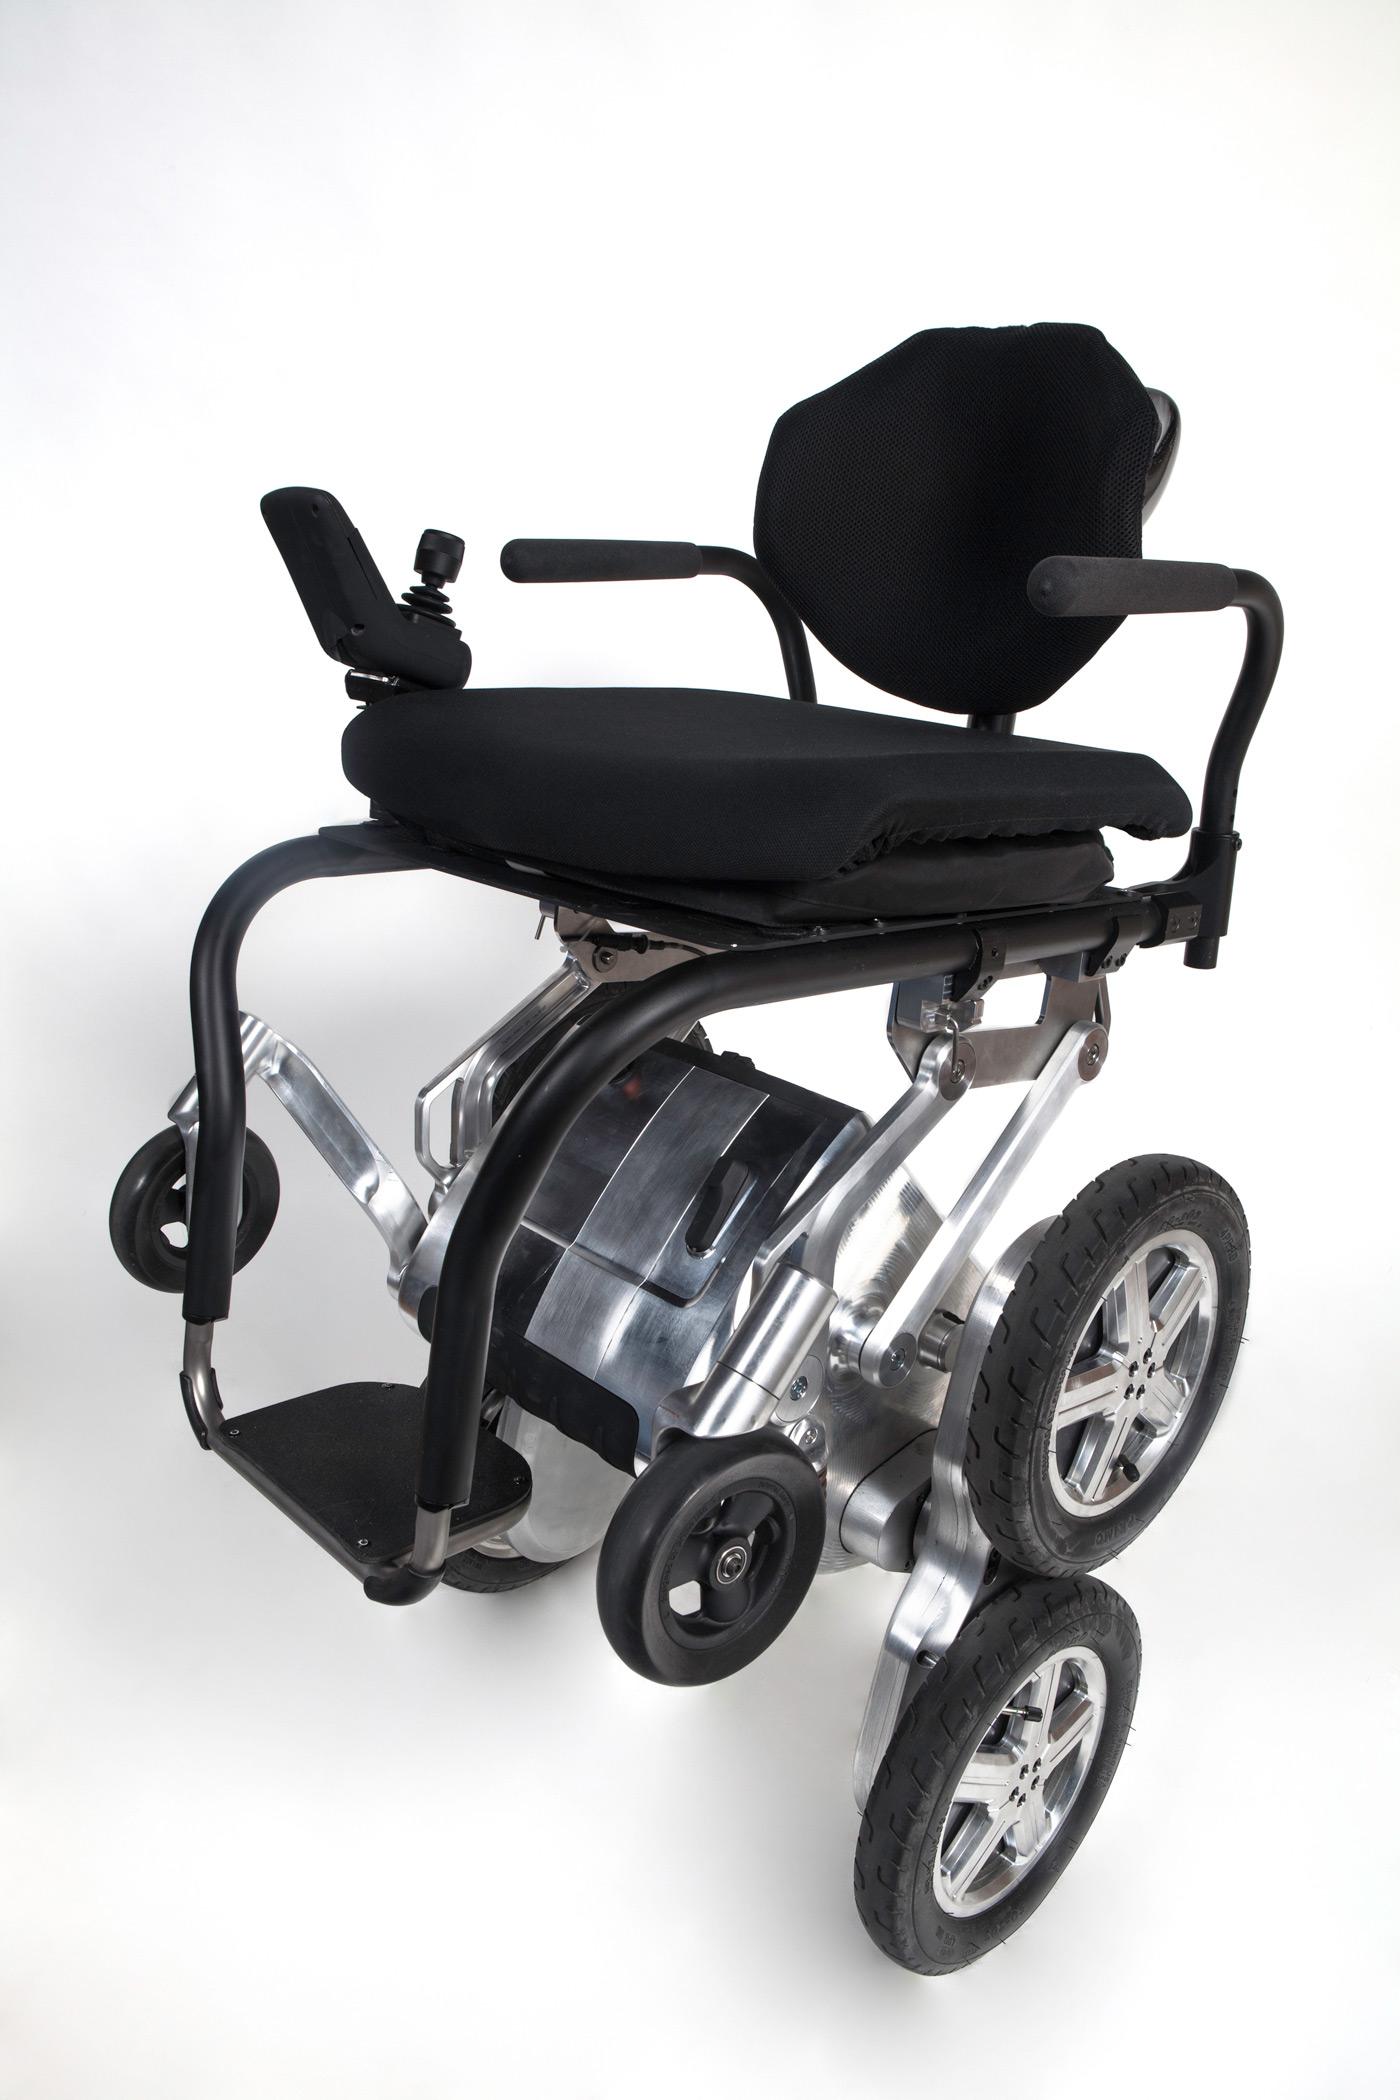 Next-generation iBot wheelchair prototype